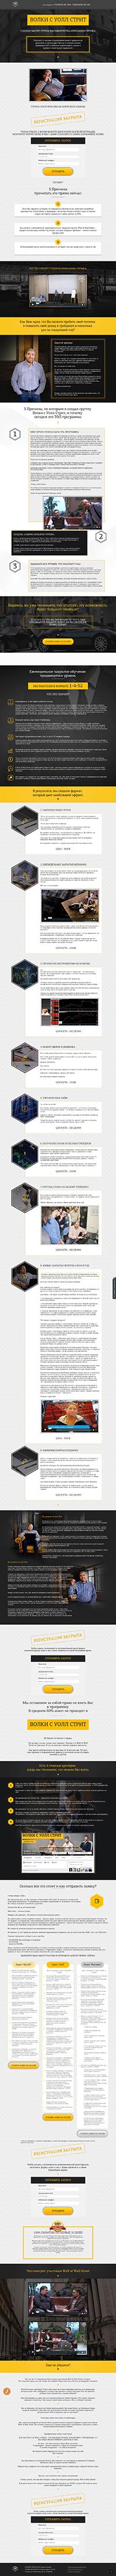 Сайт инфобизнес